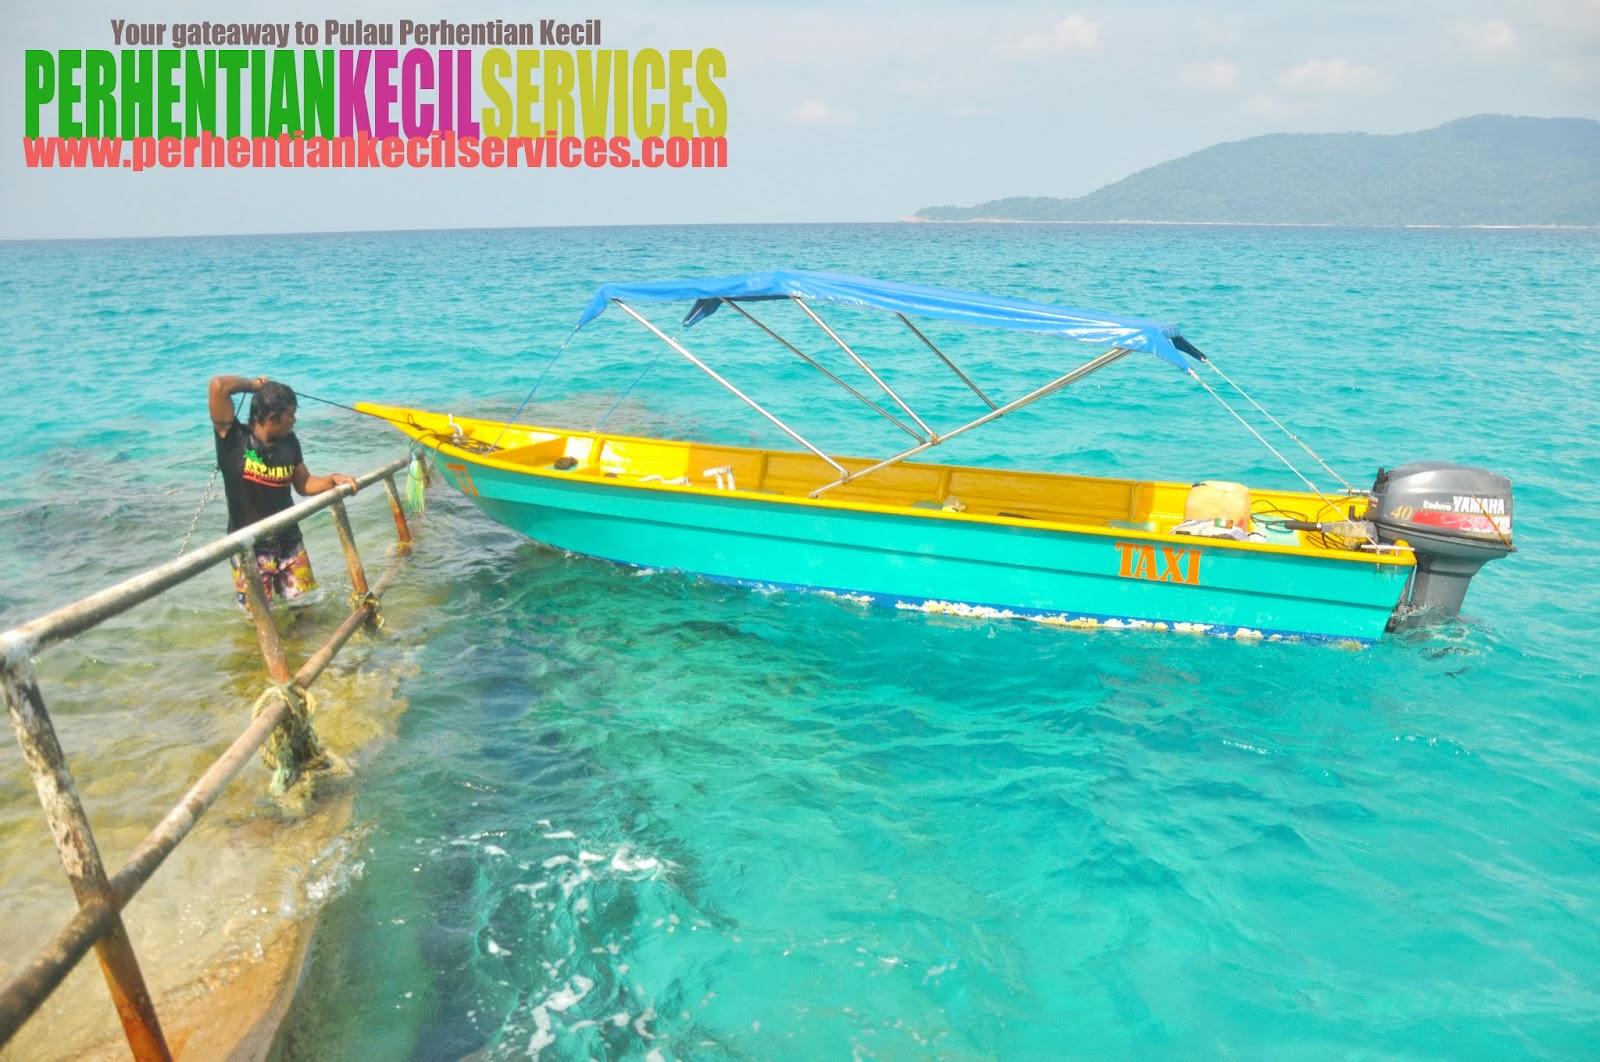 pakej pulau perhentian kecil, pakej murah pulau perhentian, pakej murah percutian pulau perhentian, perhentian kecil services